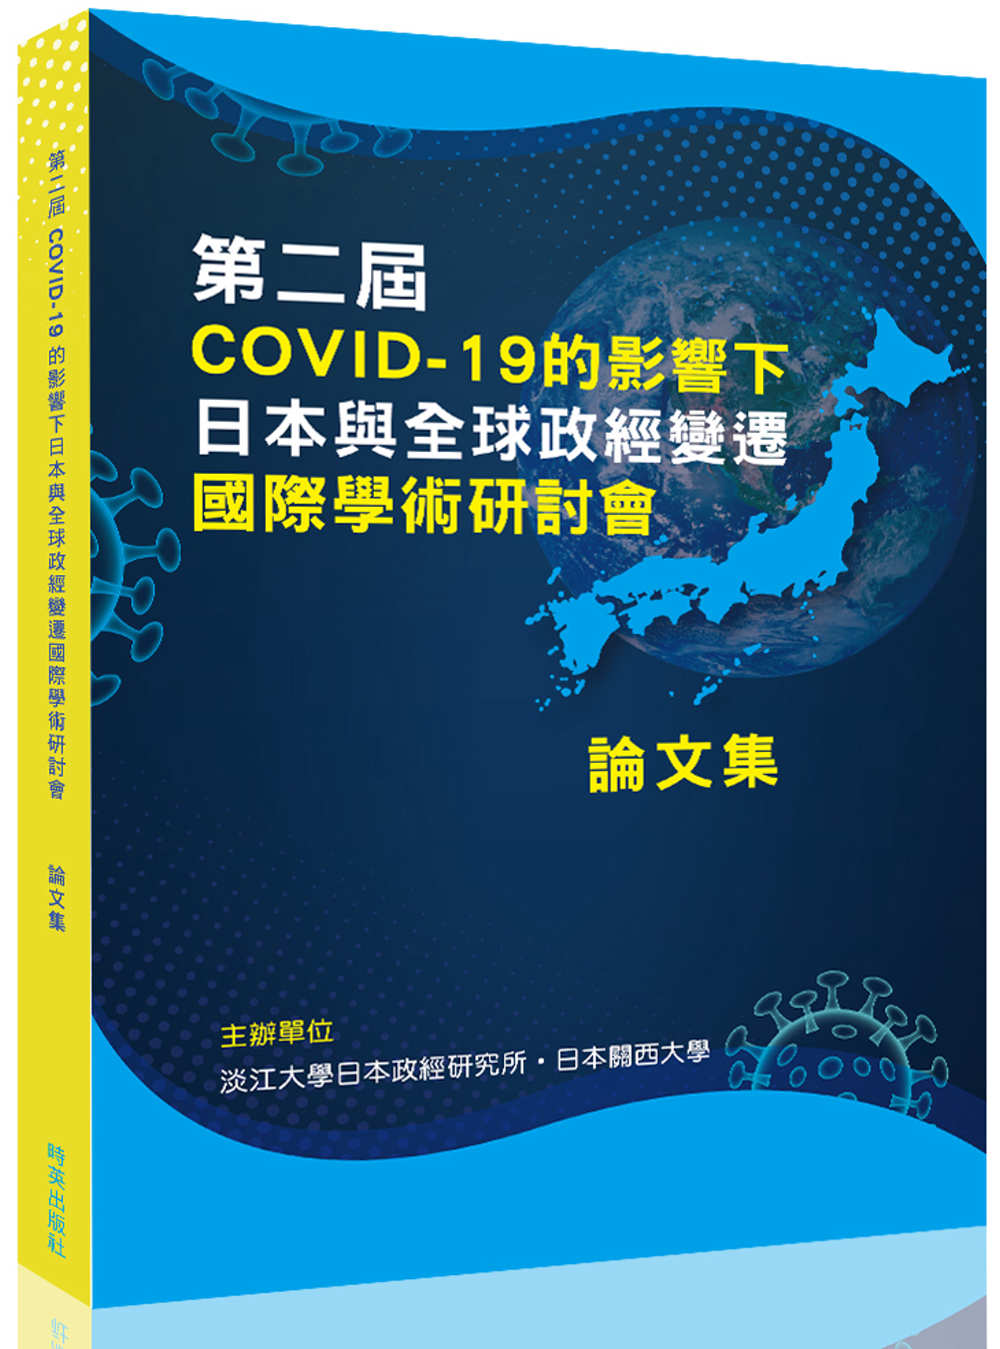 第二屆 COVID-19的影響...